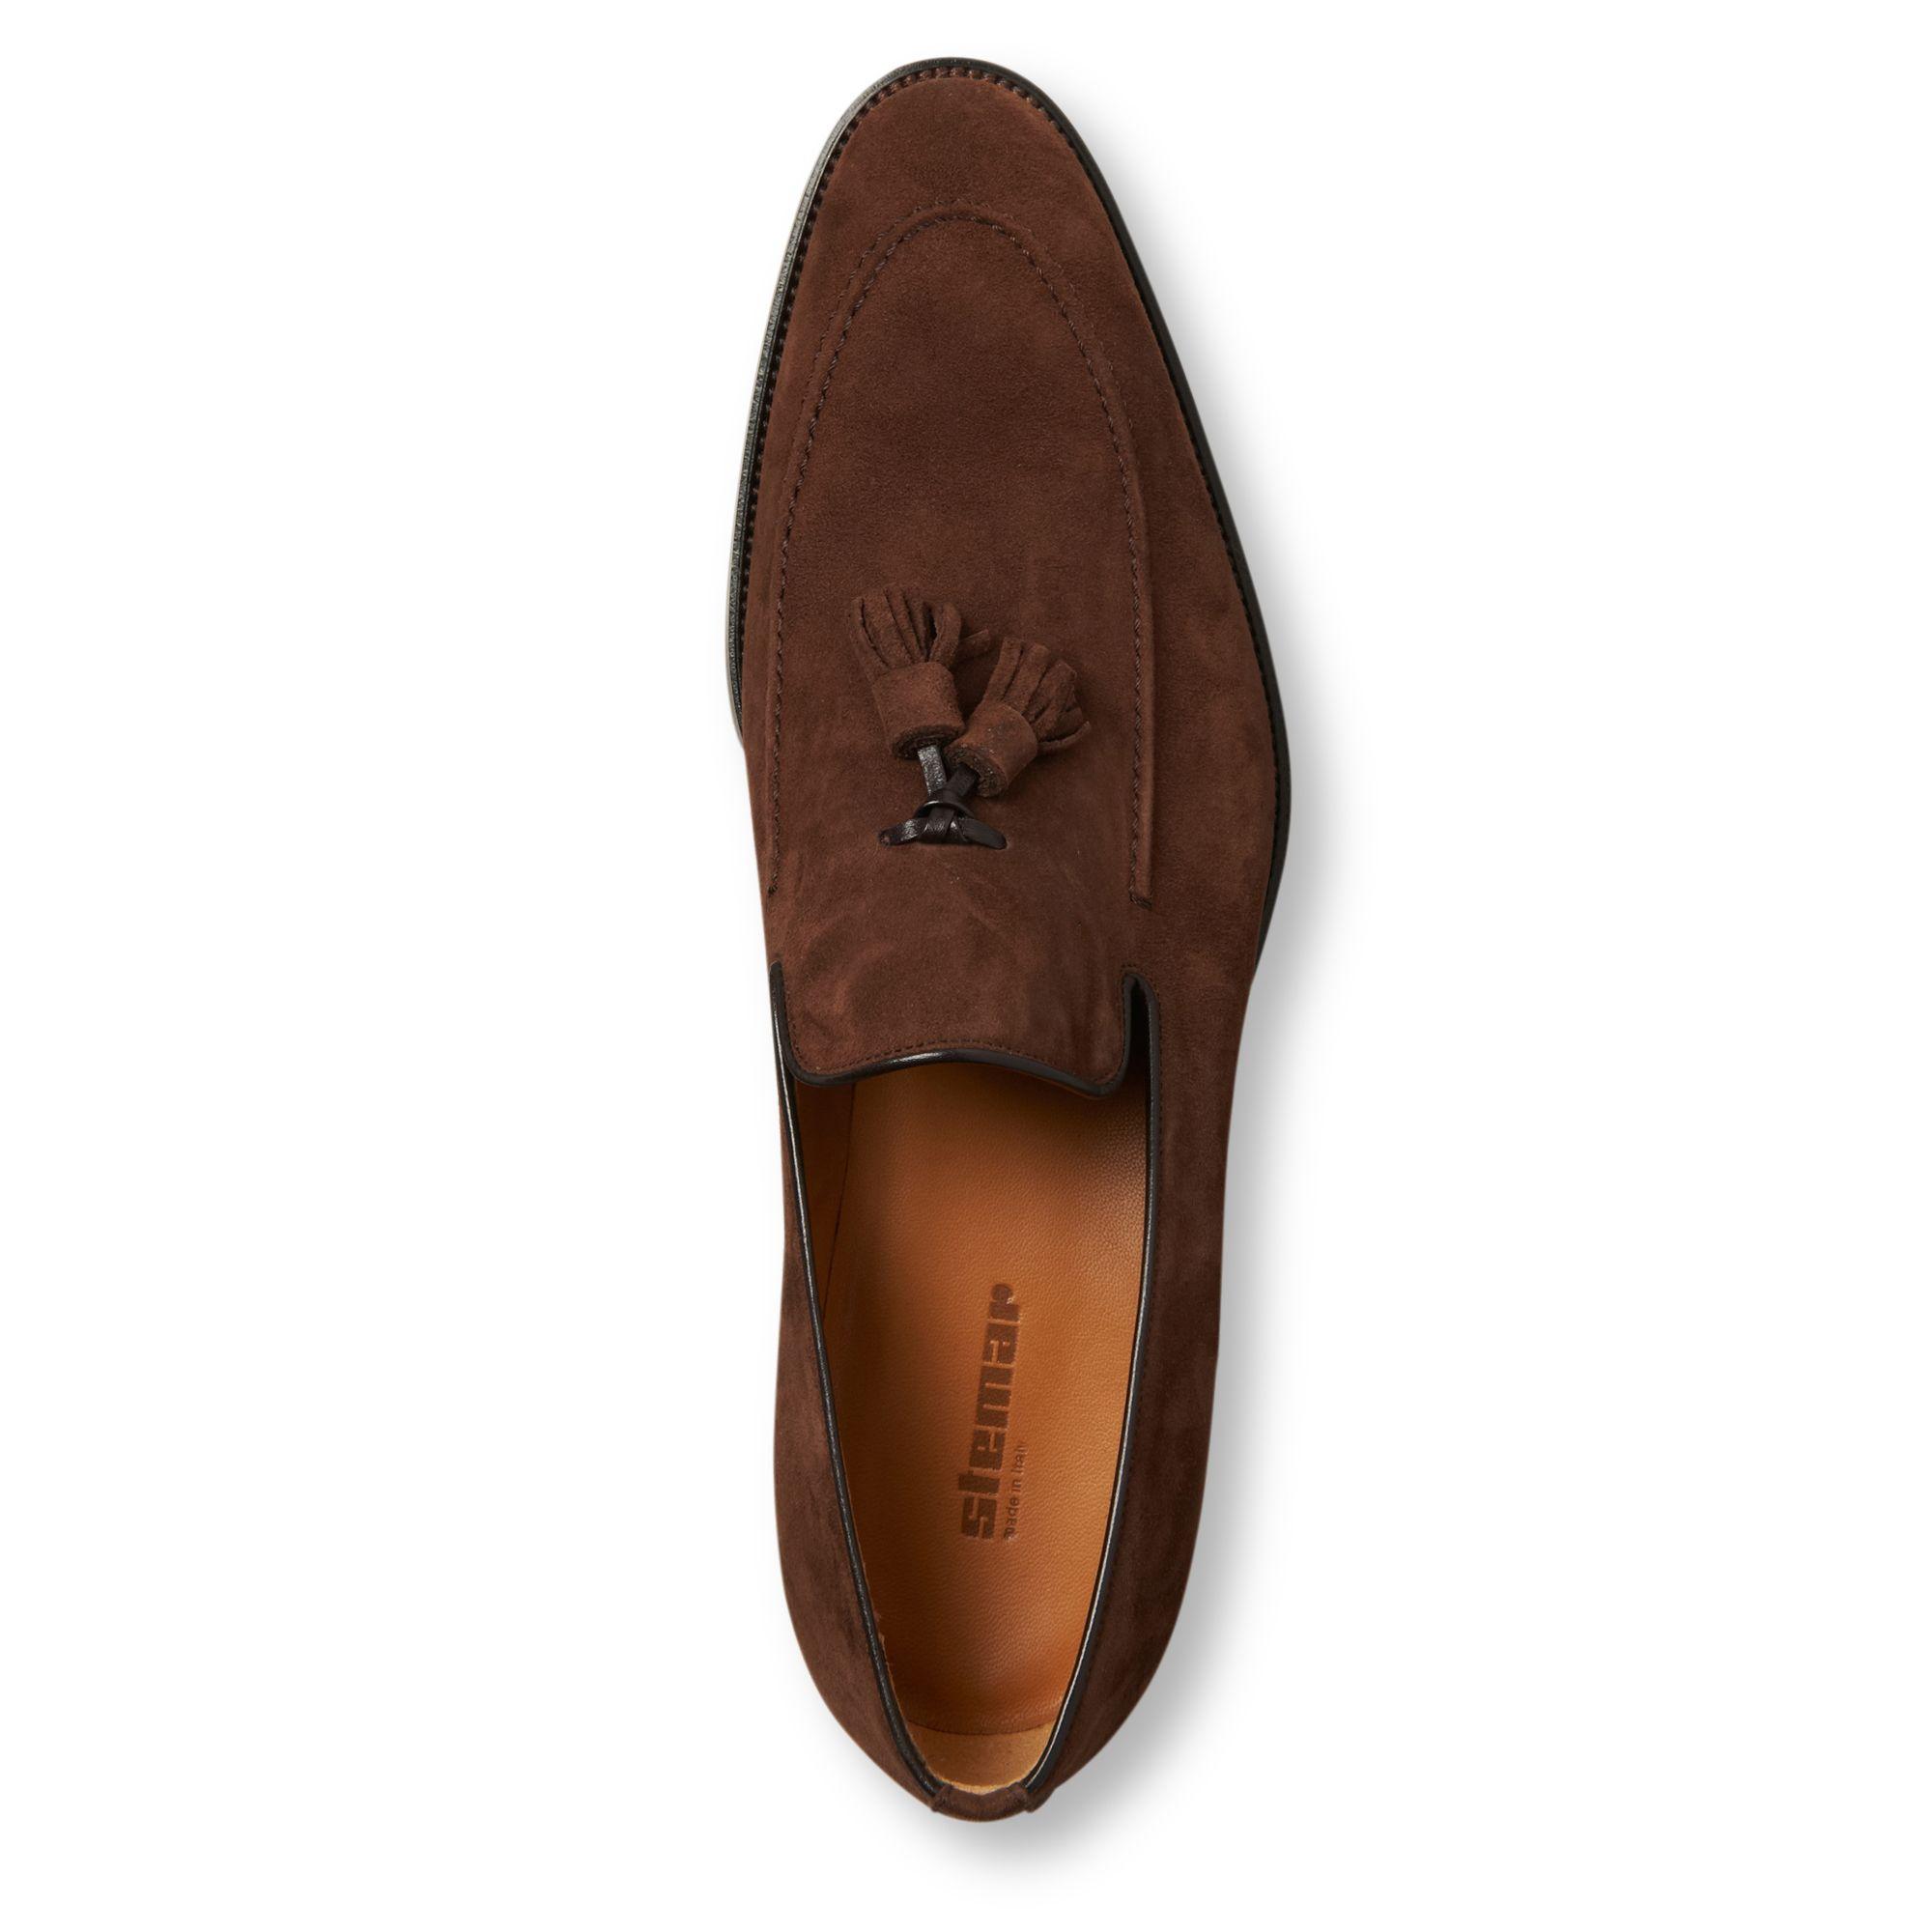 Stemar Apron Tassel Loafers in Brown for Men